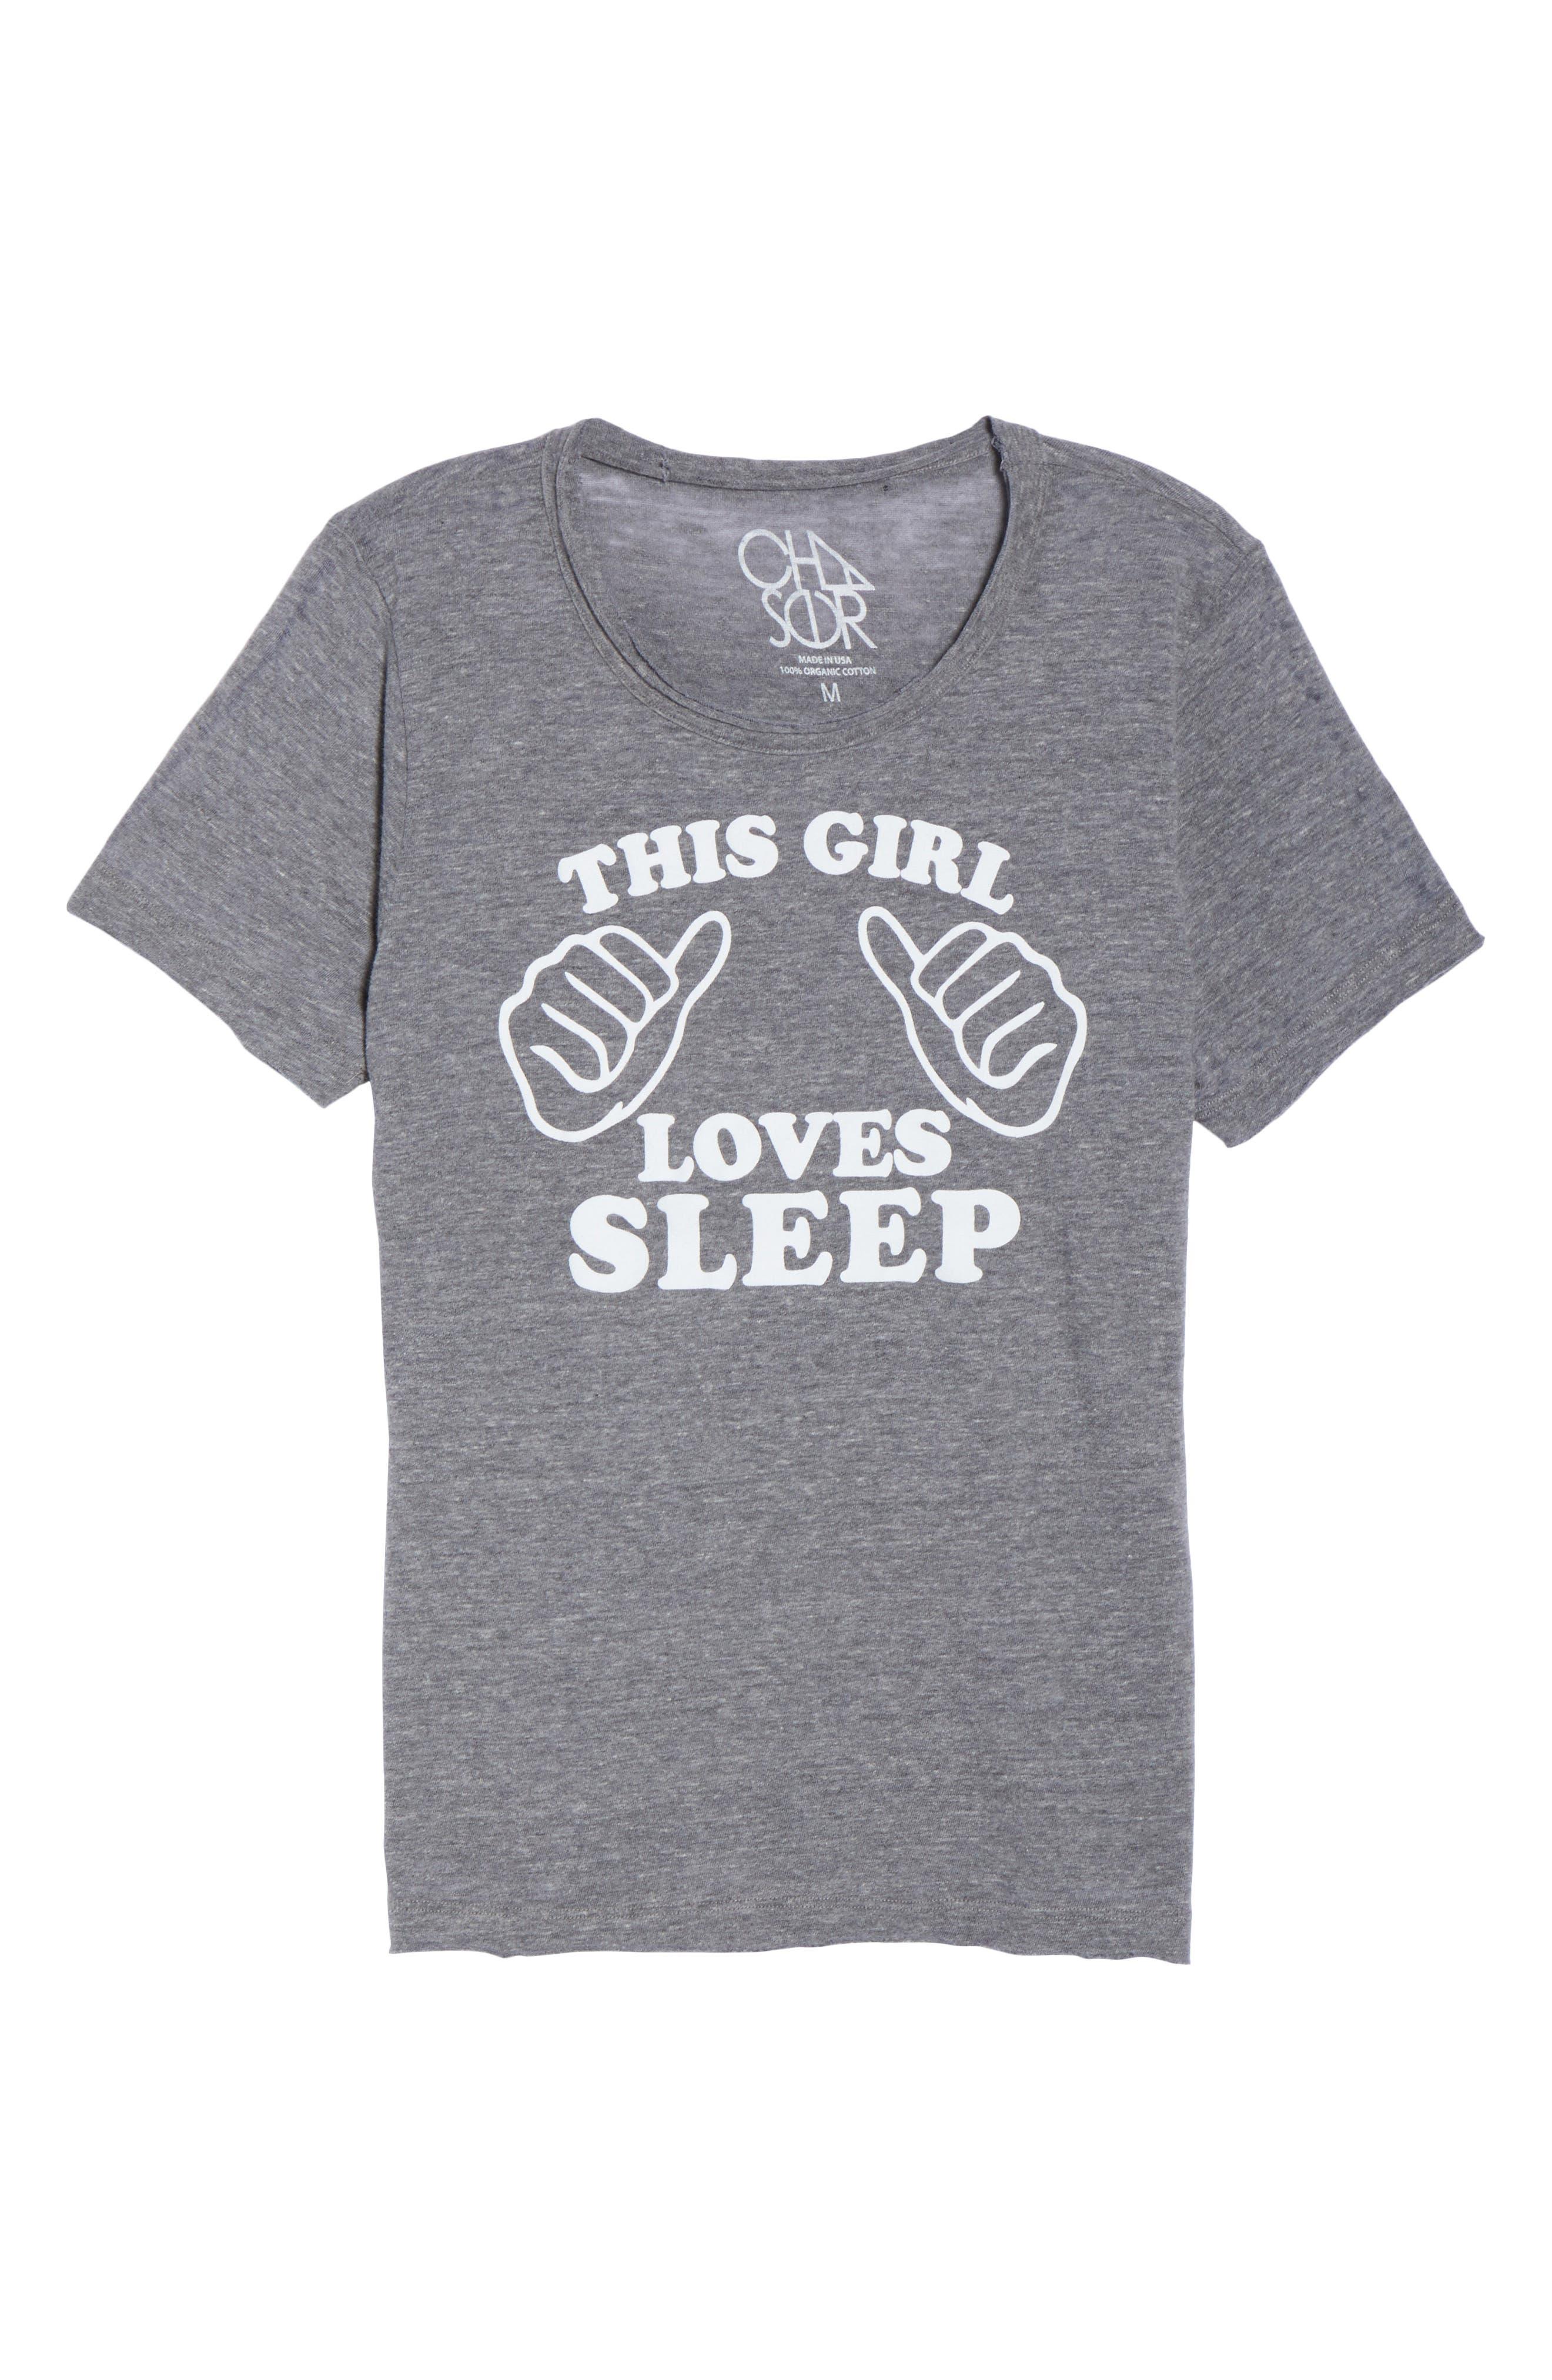 This Girl Loves Sleep Tee,                             Alternate thumbnail 6, color,                             035